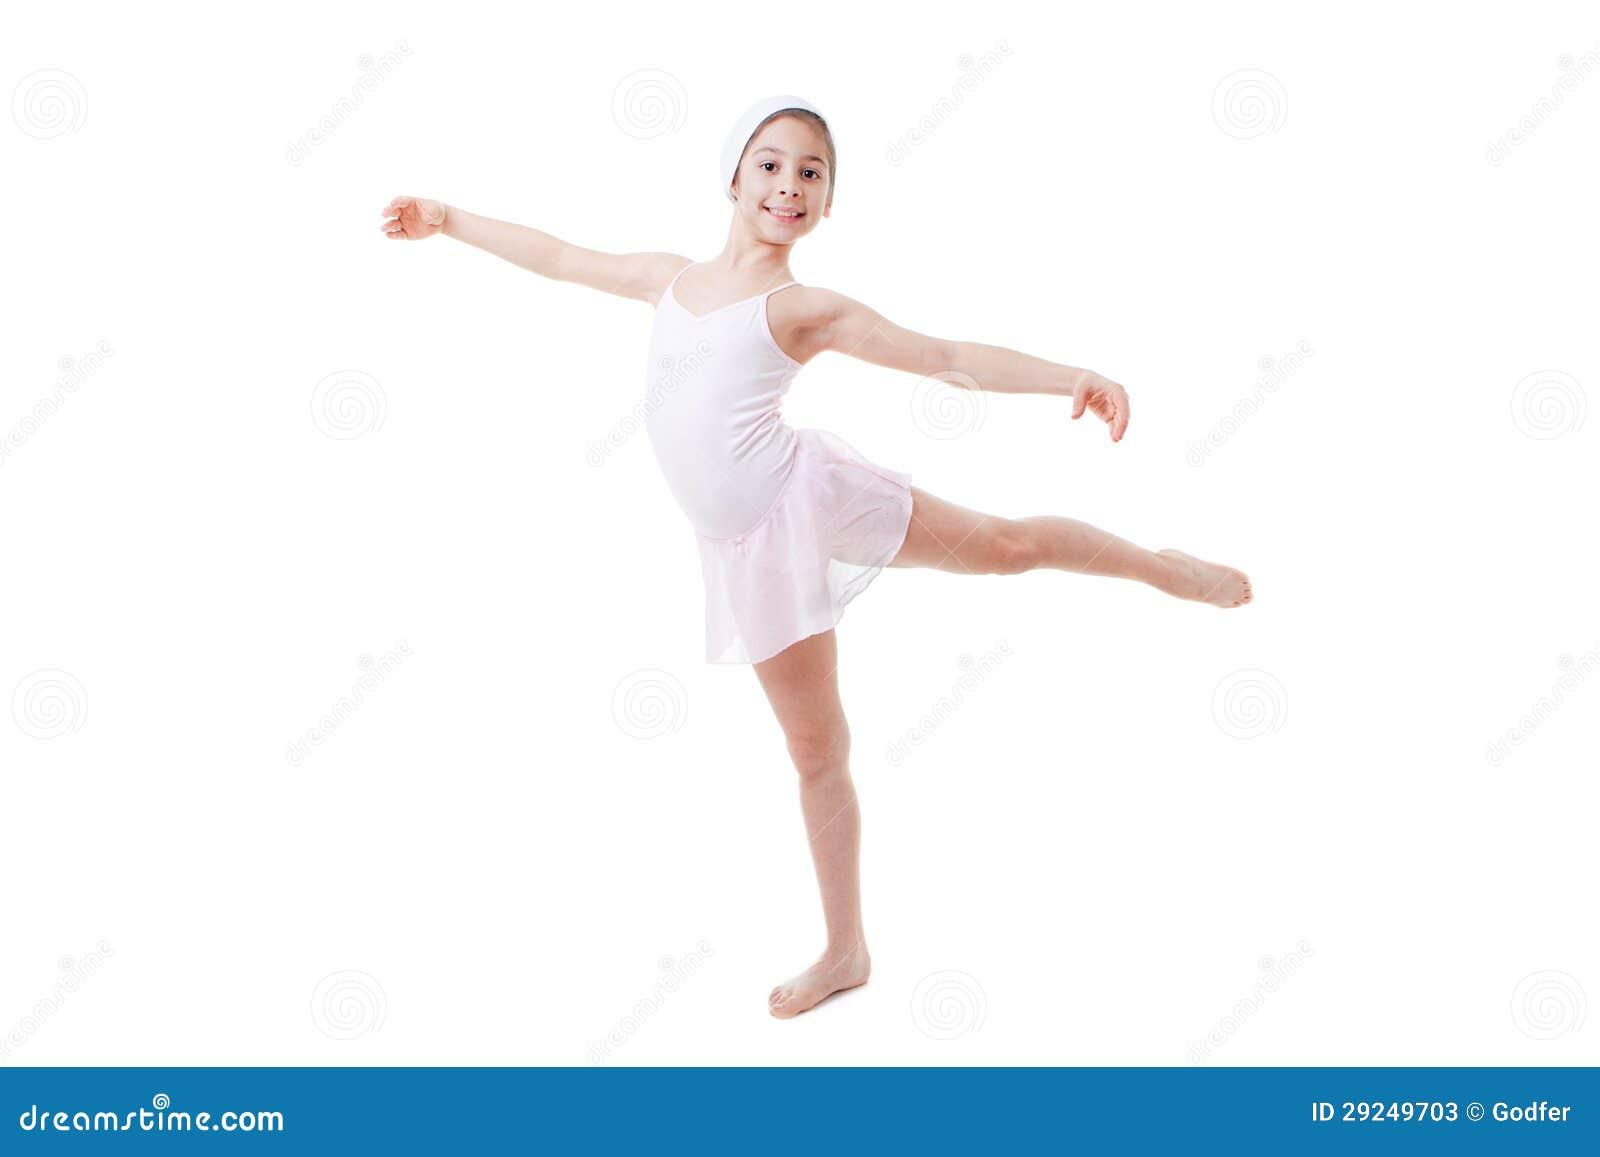 Child Ballet Pose Stock Image Image Of Child Balancing 29249703